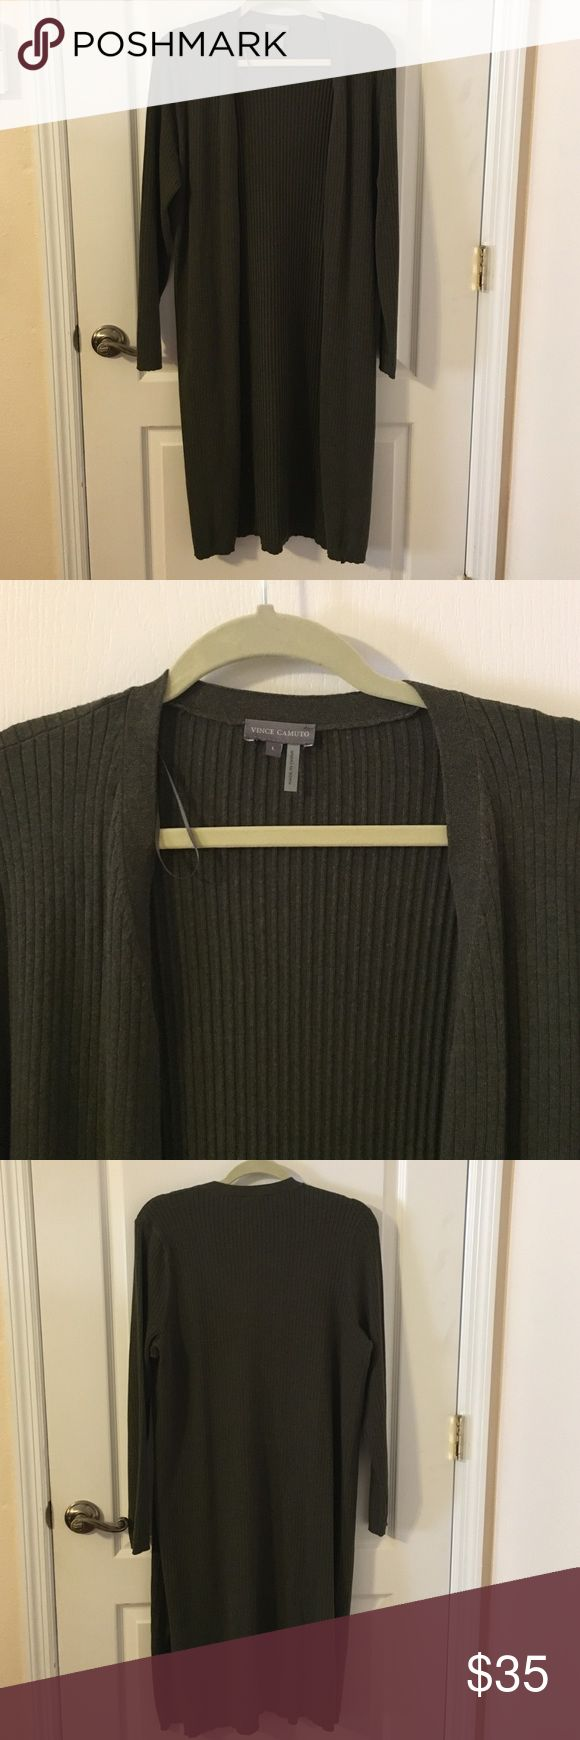 Vince Camuto Olive Green Cardigan NWOT Large Size Large Vince Camuto Cardigan Vince Camuto Sweaters Cardigans